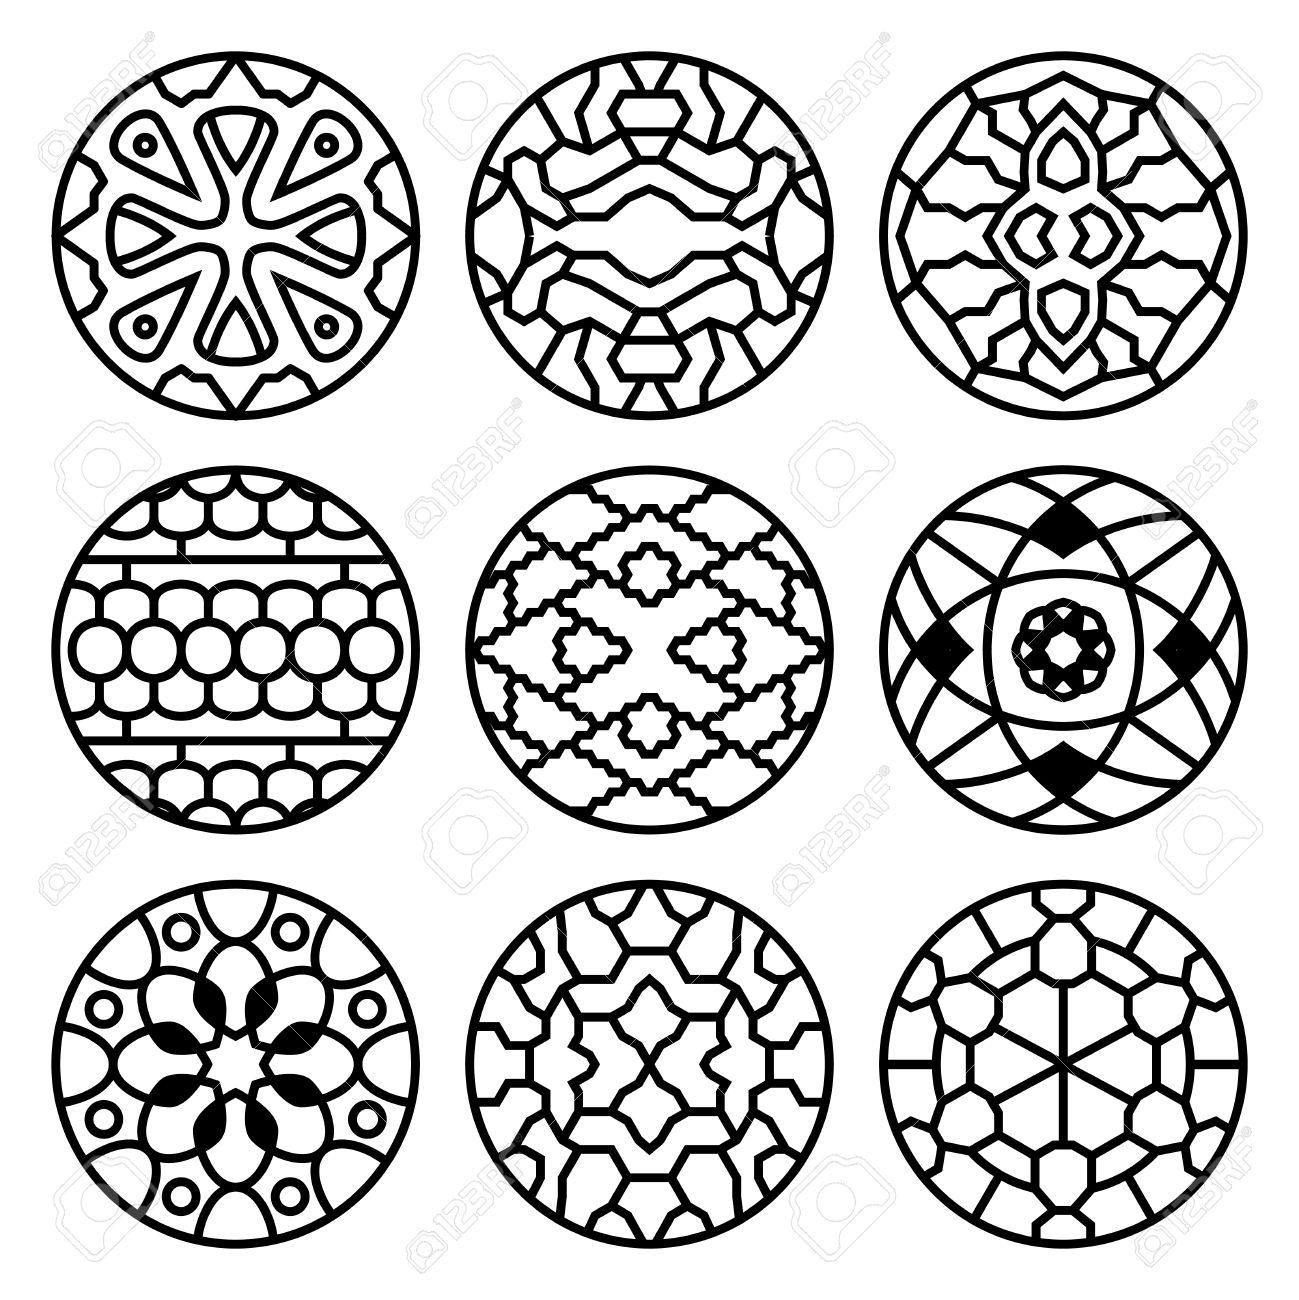 Korean traditional vector ancient buddhist patterns ornaments korean traditional vector ancient buddhist patterns ornaments and symbols tattoo oriental decorative illustration stock biocorpaavc Images